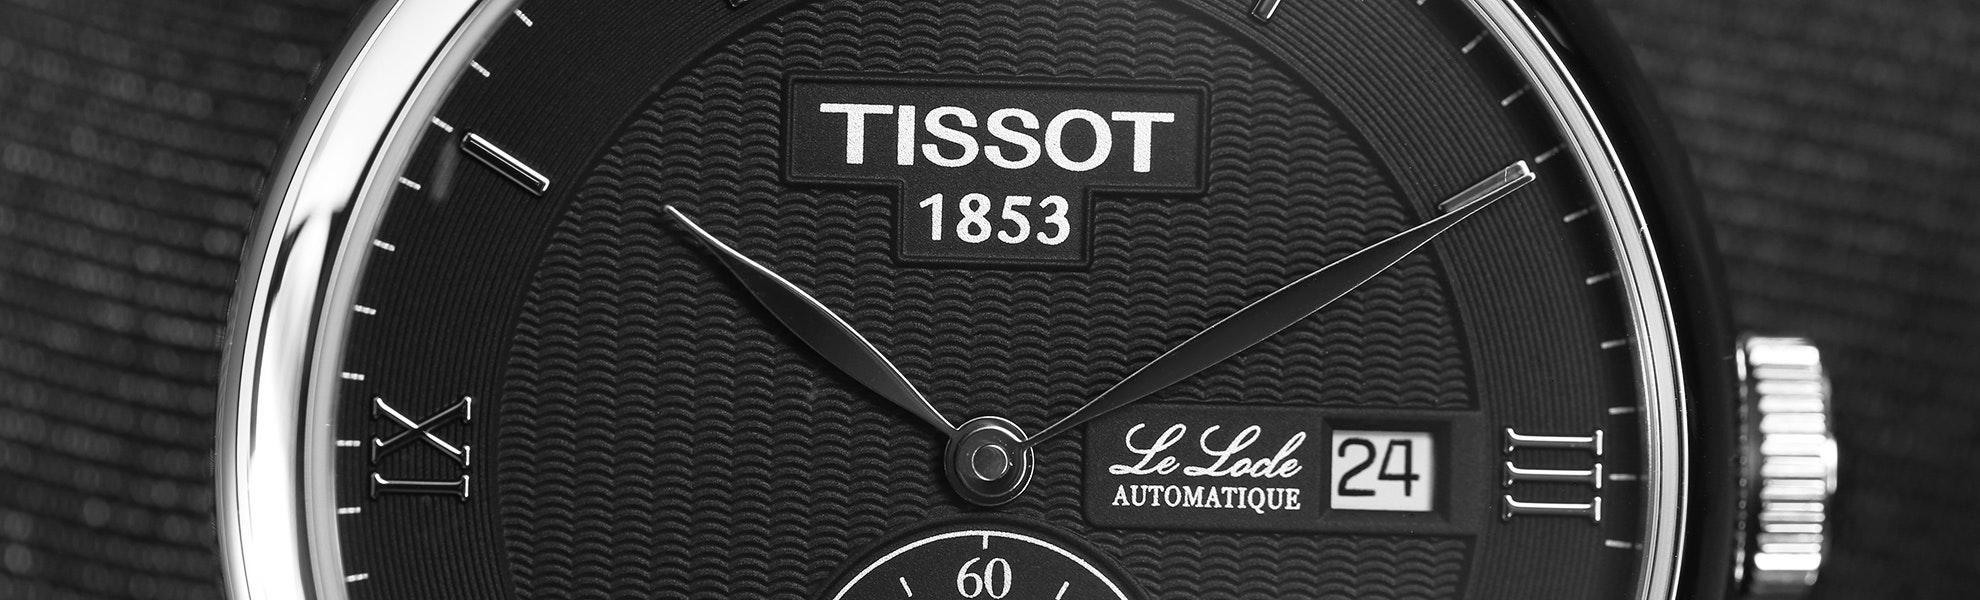 Tissot Le Locle Petite Seconde Watch